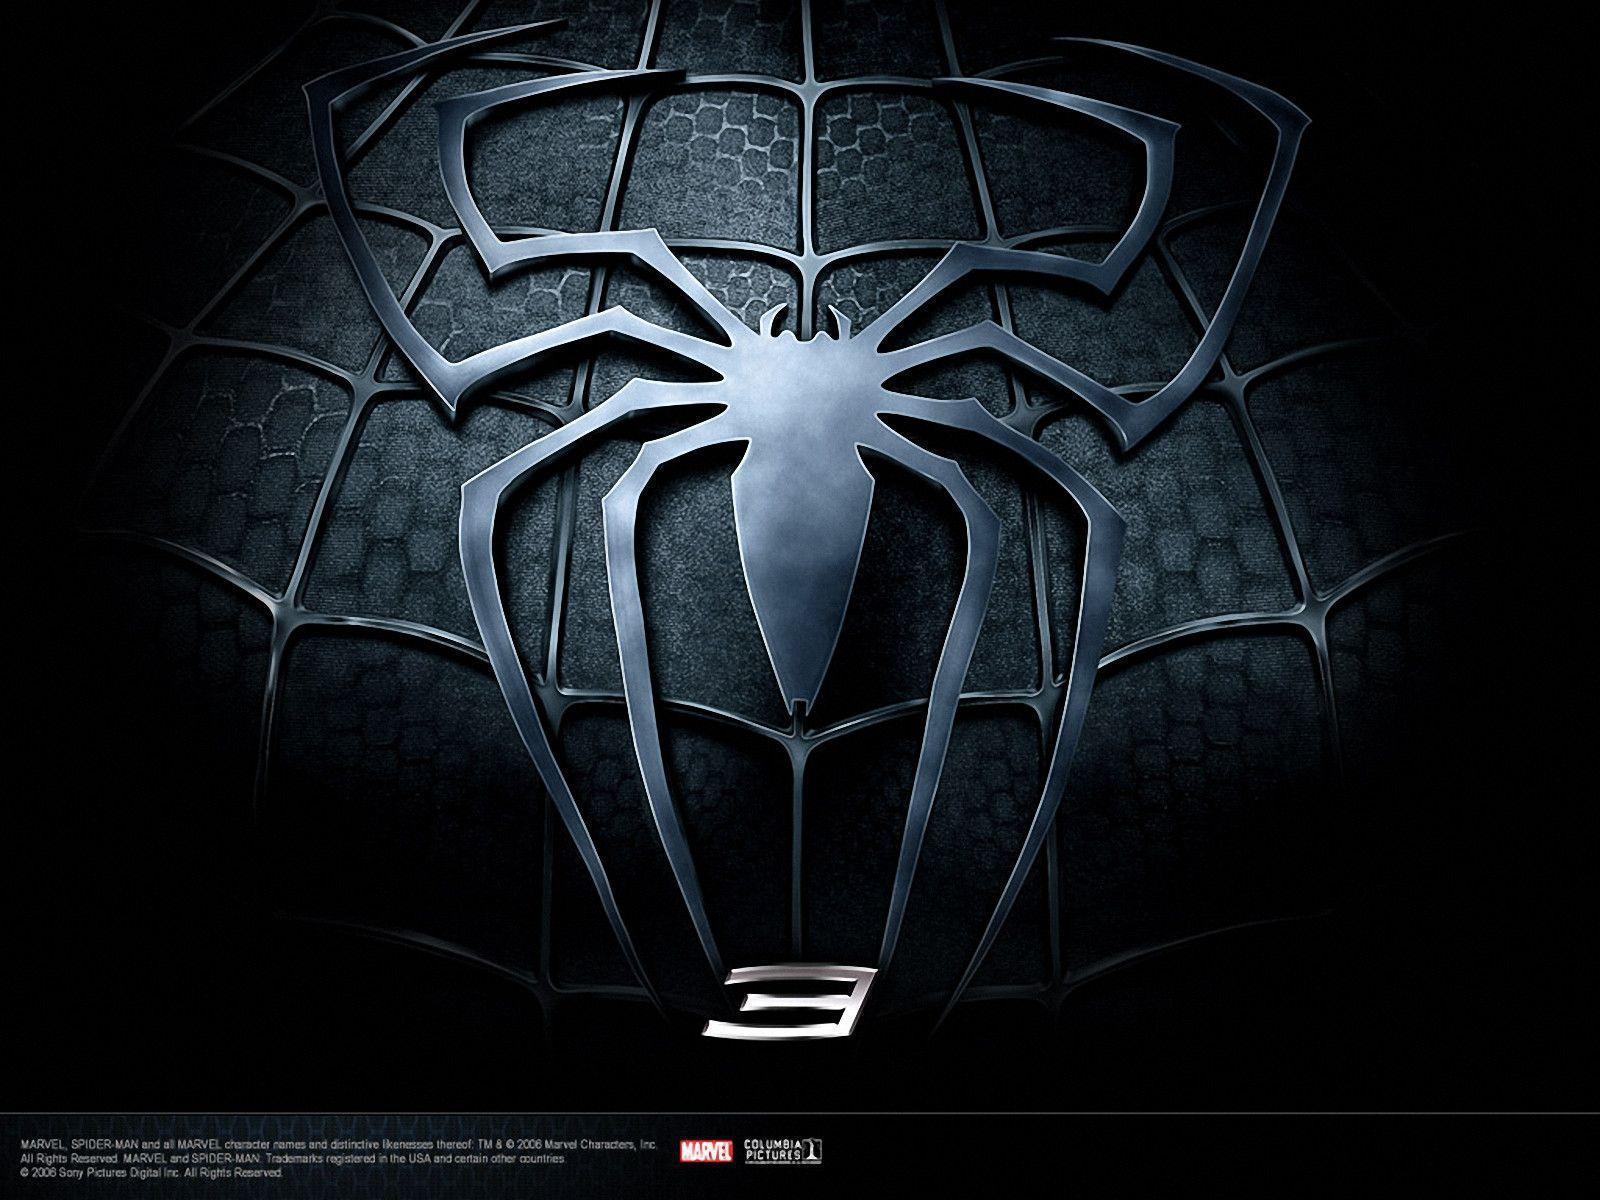 Hd wallpaper spiderman - Spiderman Full Hd Wallpapers Wallpaper Hdmarvelwallpaper